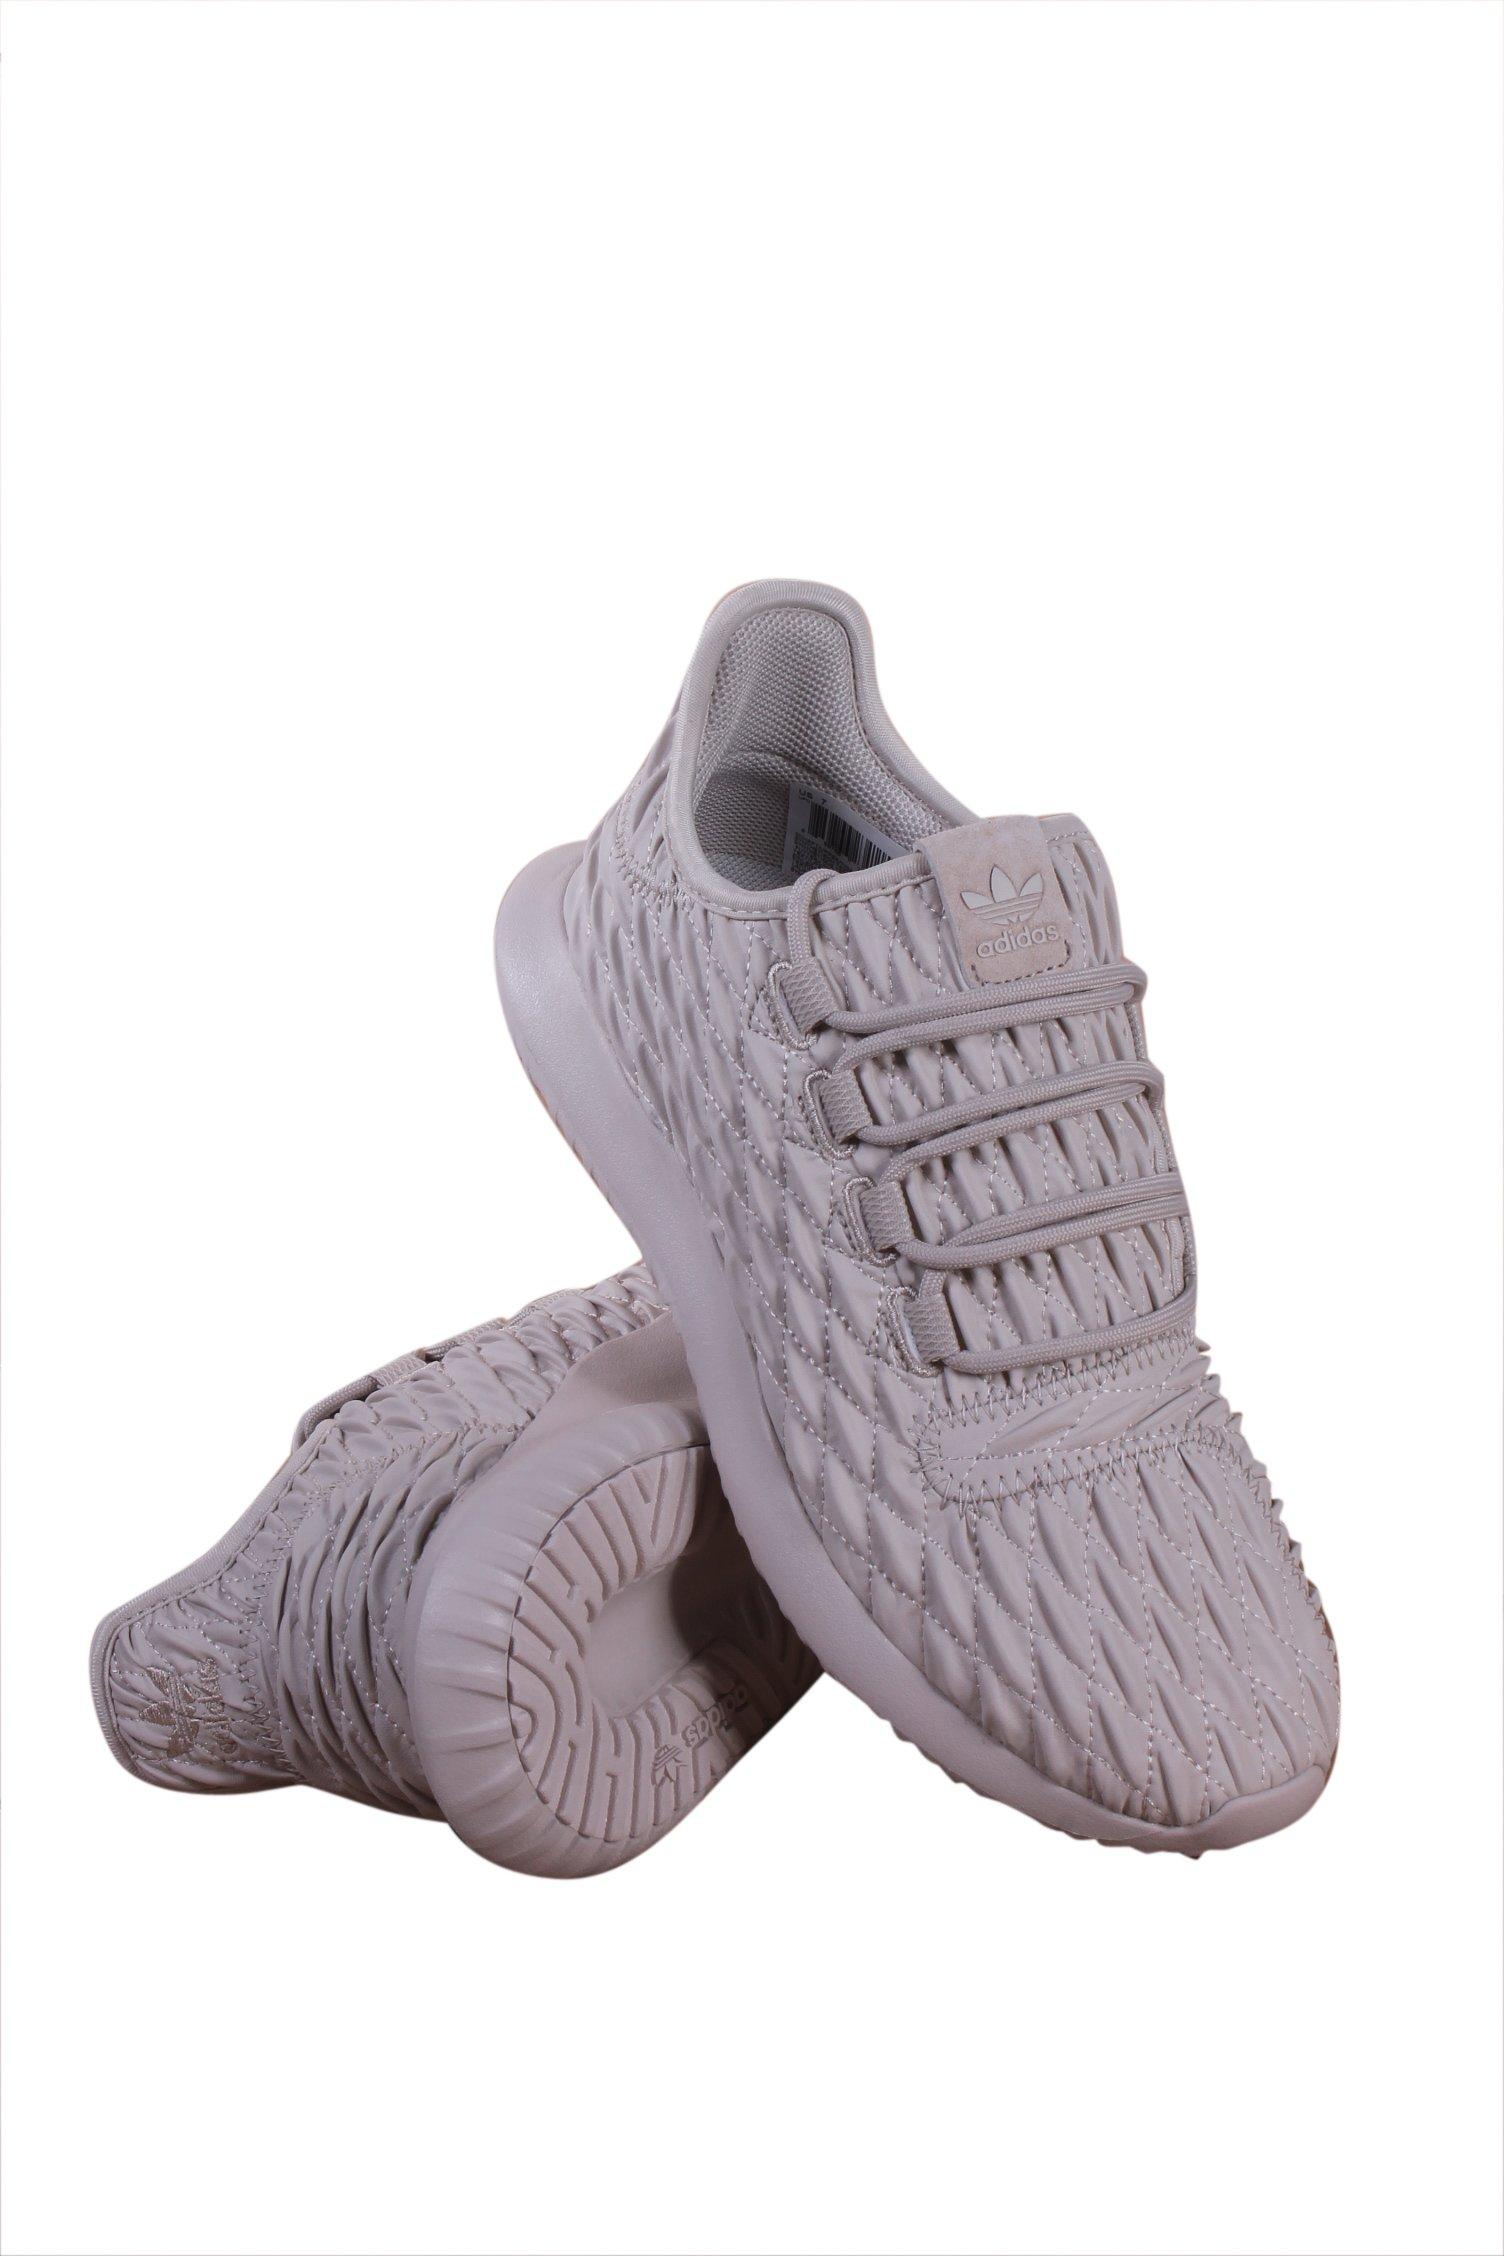 6a29ca214bc1 Galleon - Adidas Originals Men s Tubular Shadow Fashion Sneaker ...